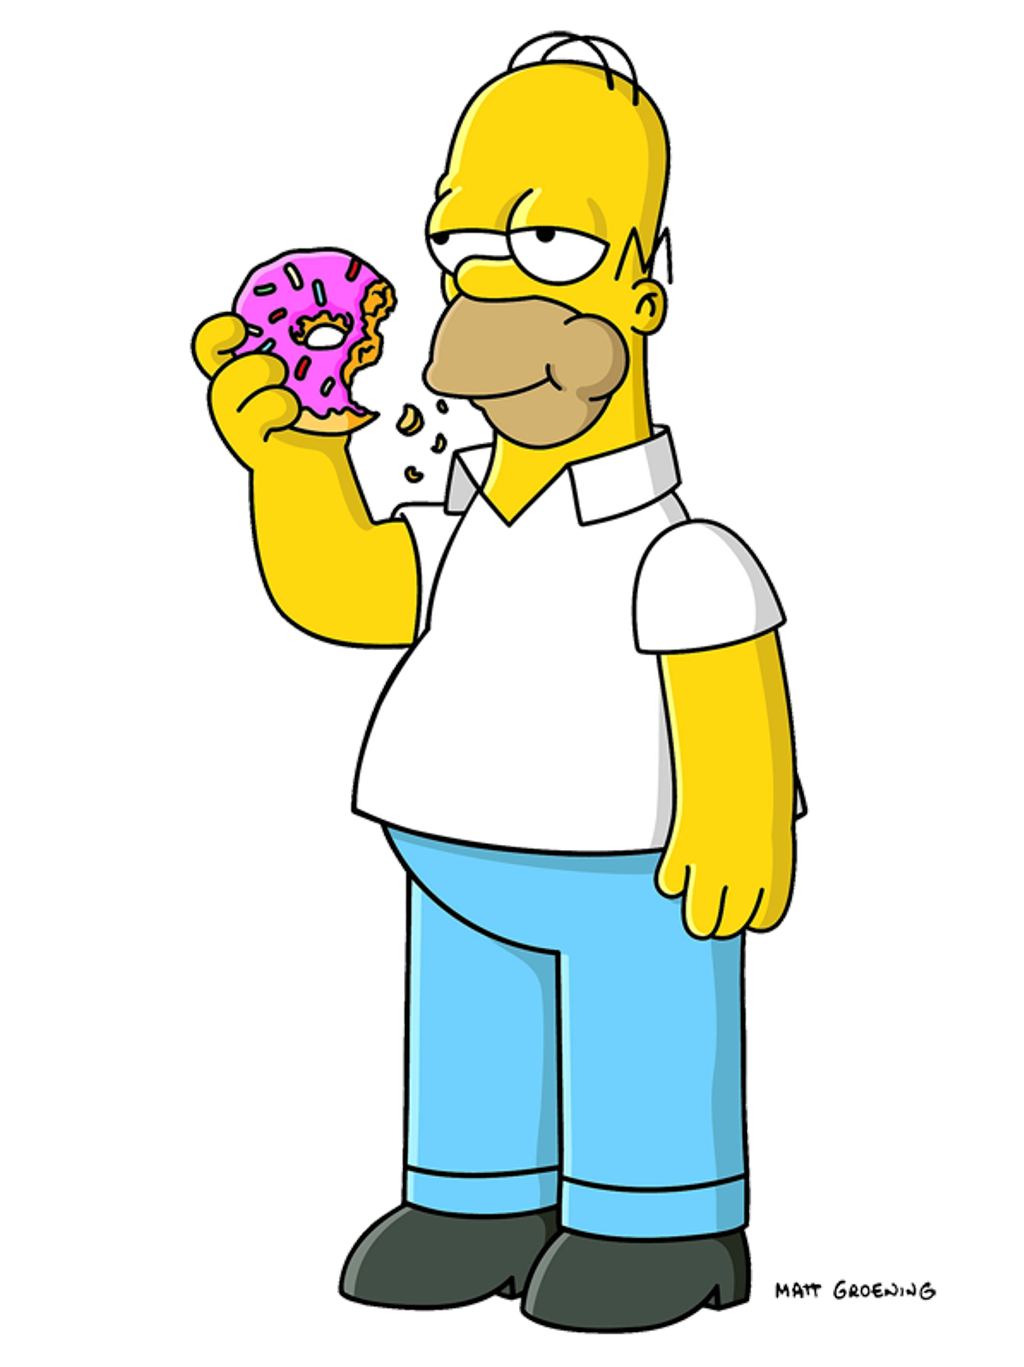 Homero Simpson Png (+).